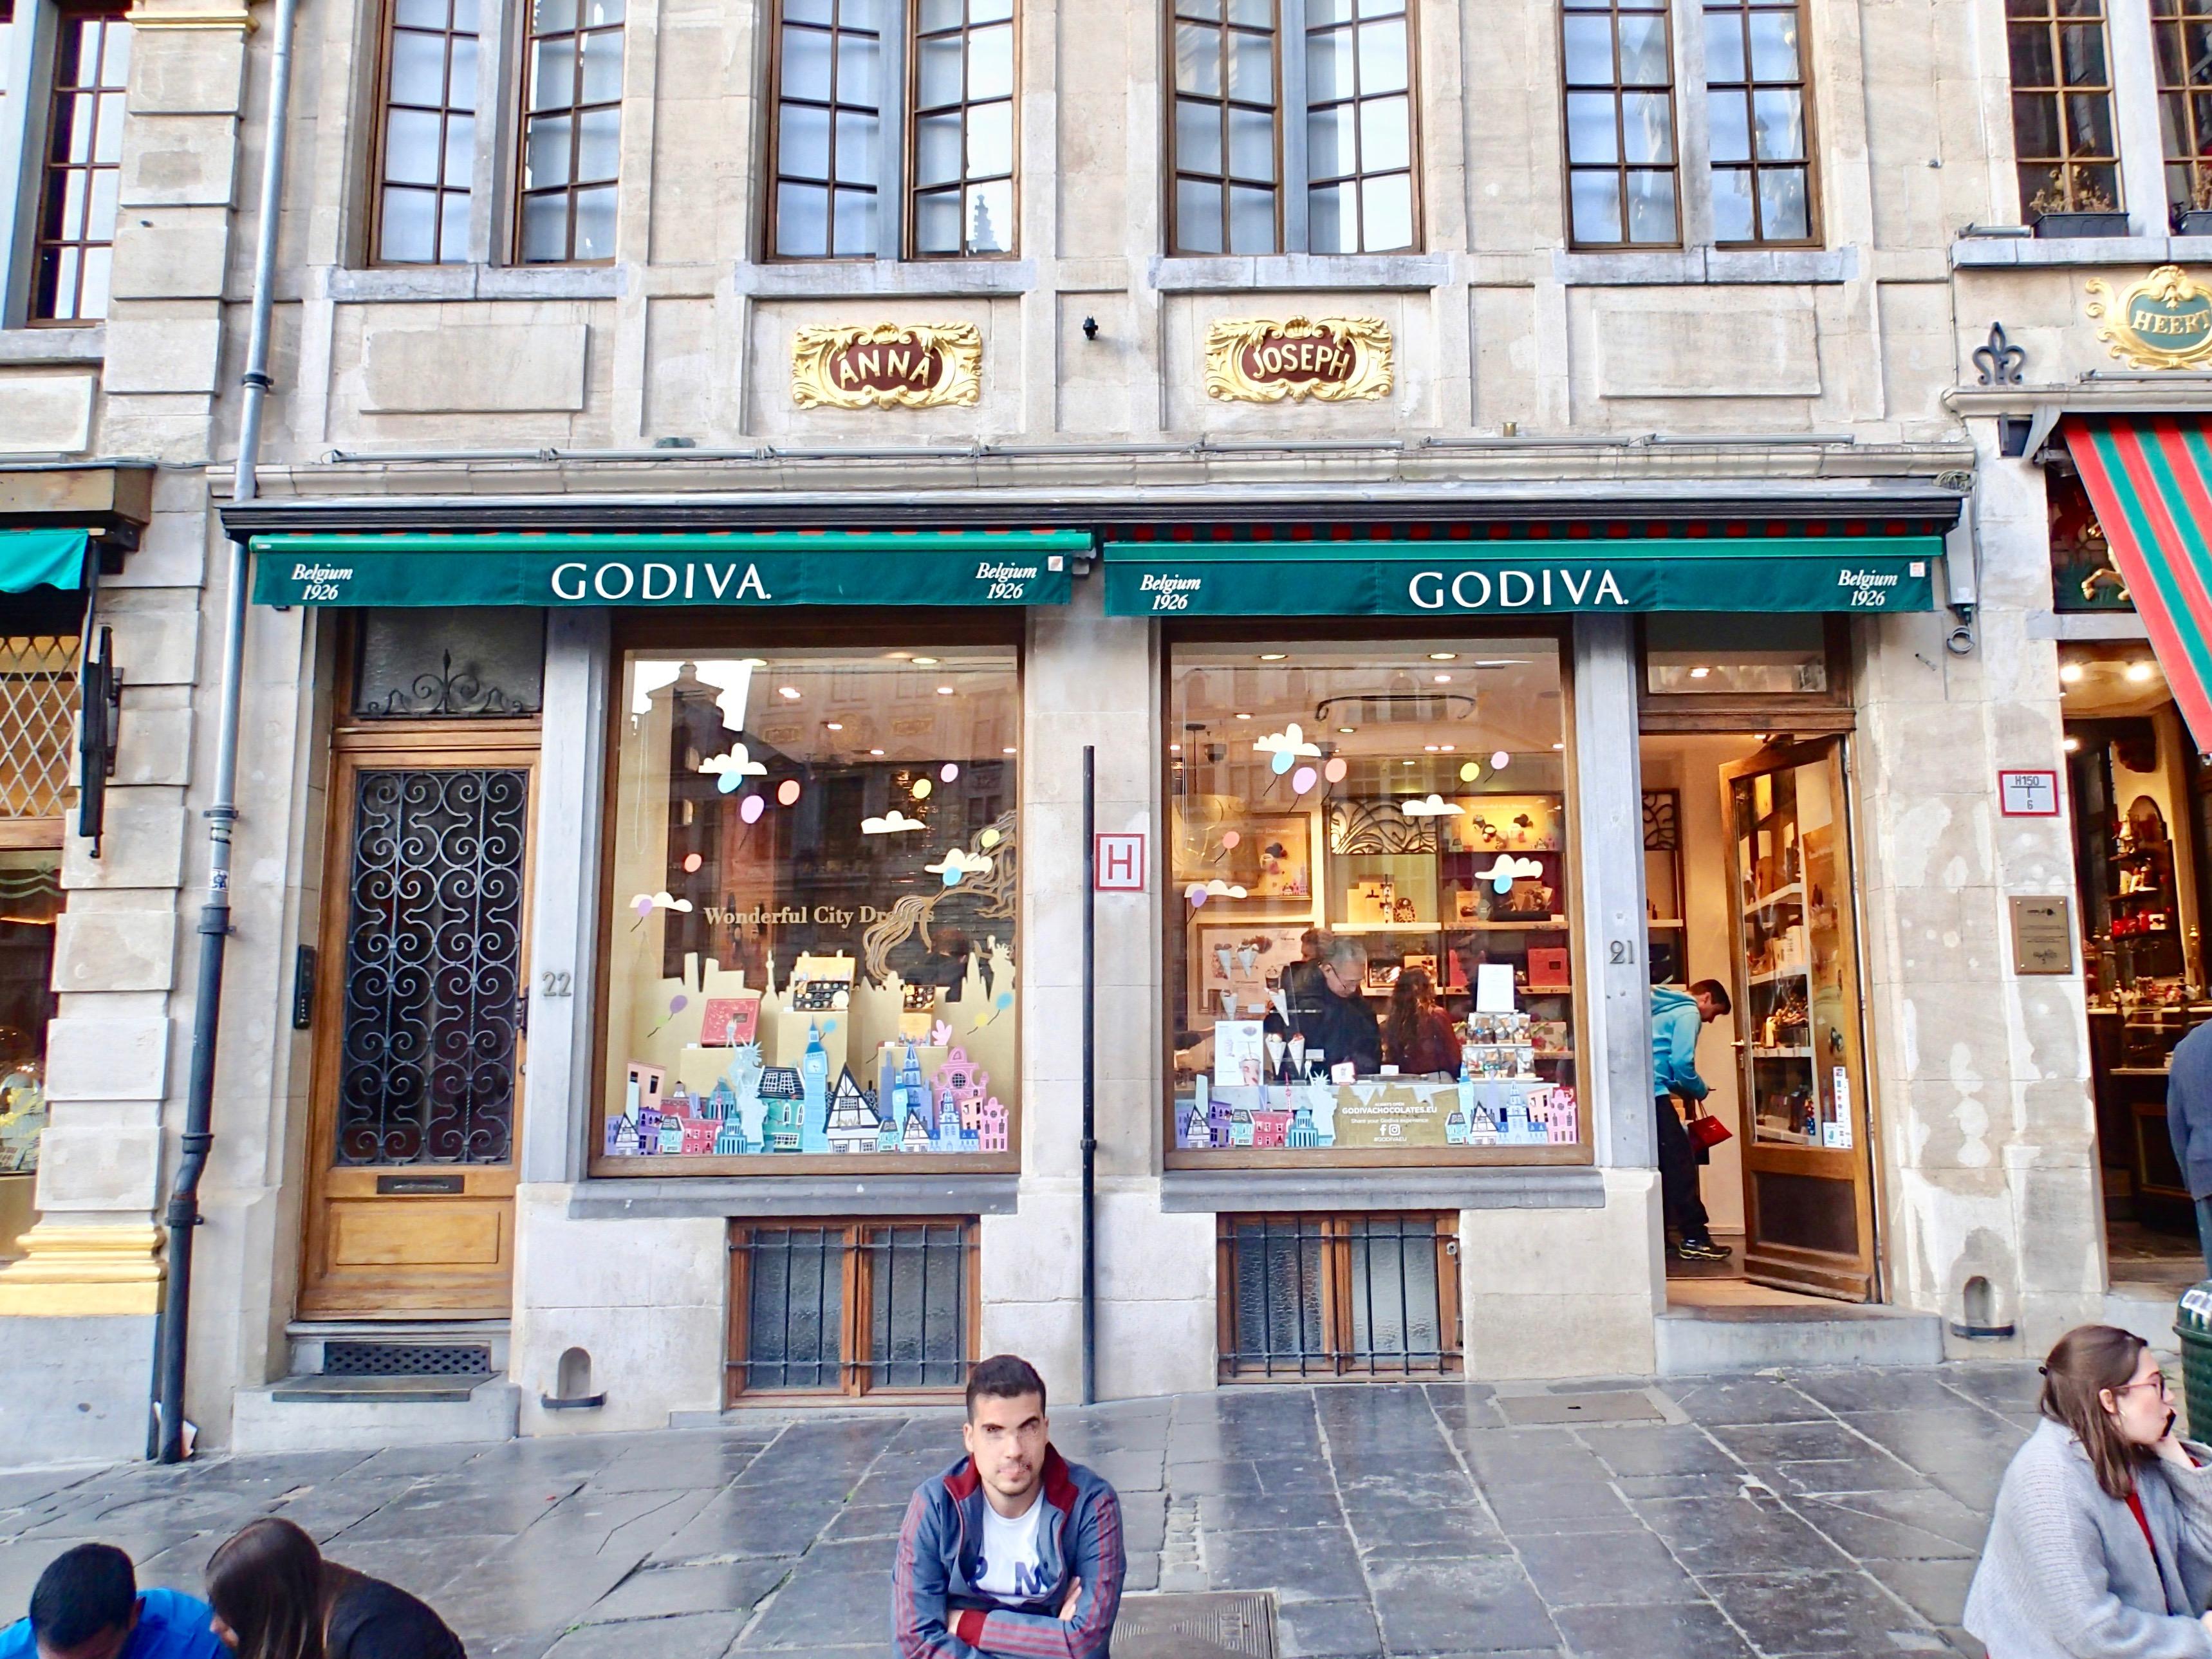 Godiva outside